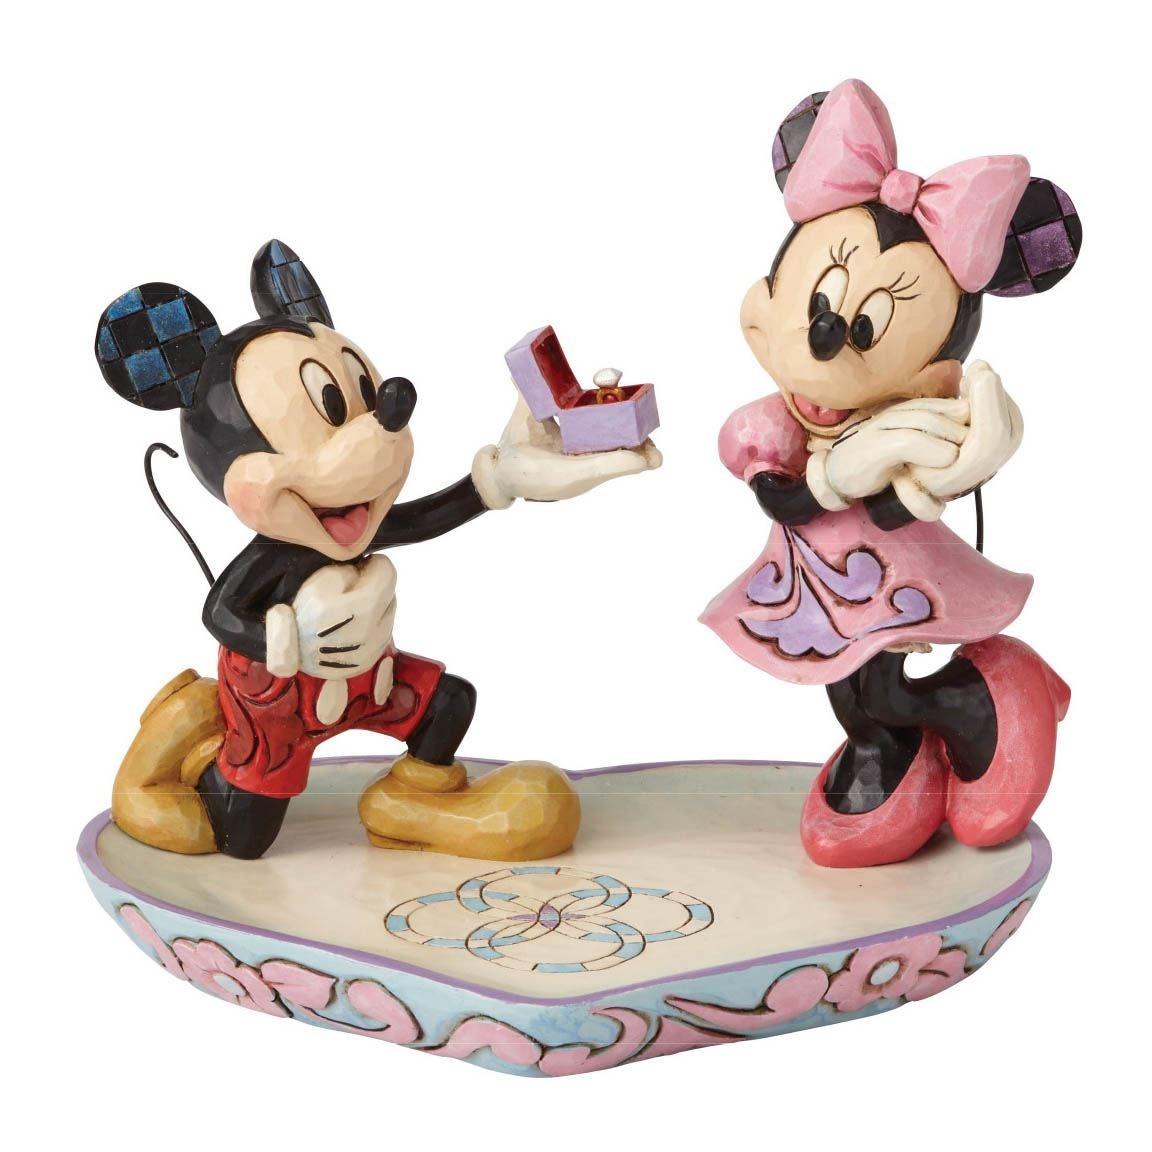 jim shore minnie og mickey mouse figur minnie mouse gaveideer - Minnie Mouse gaveideer til voksne